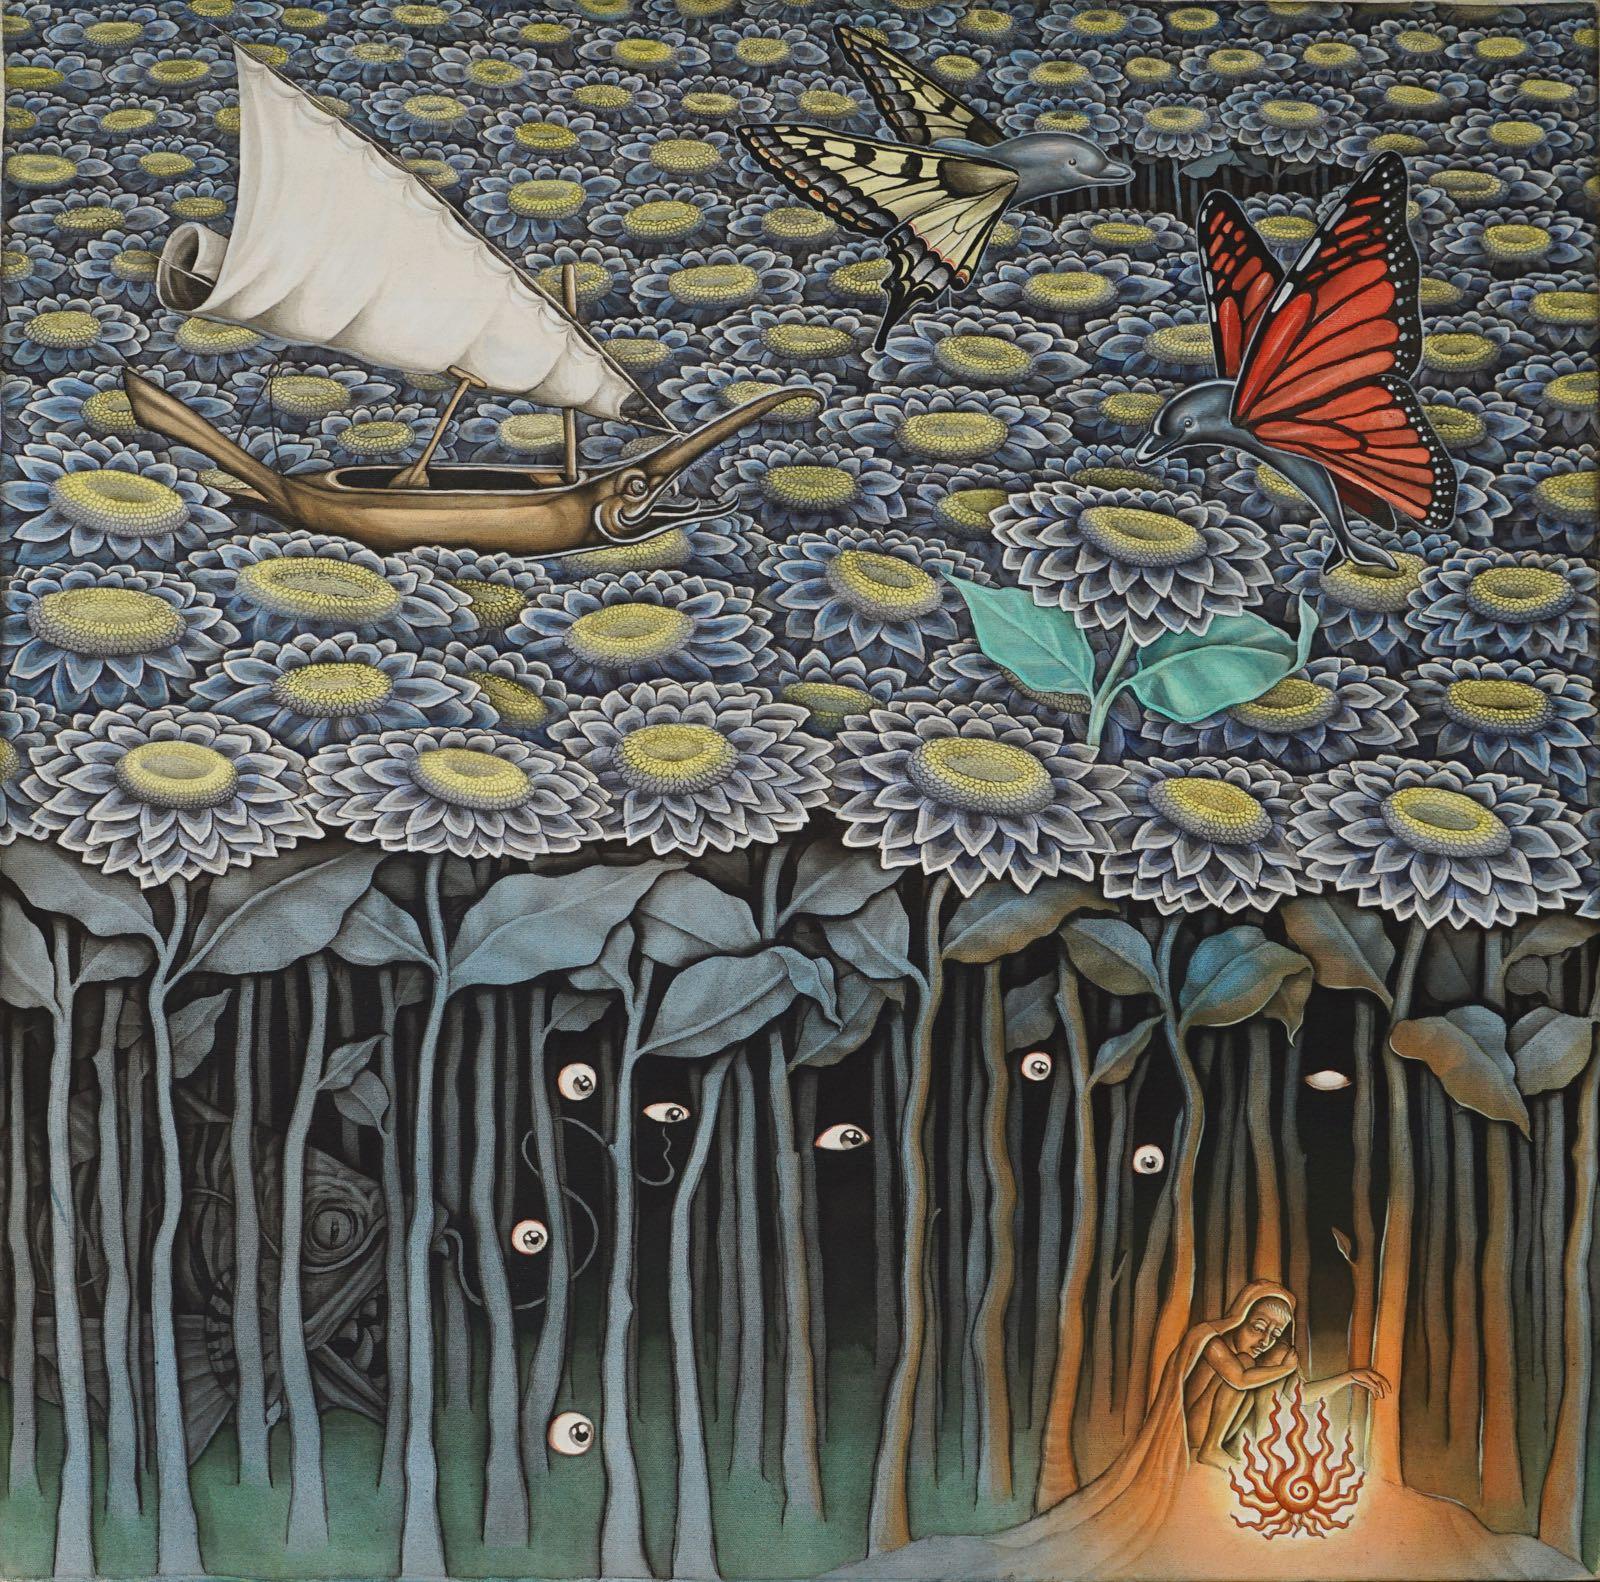 Wayan Budiarta - Drowning - 2017